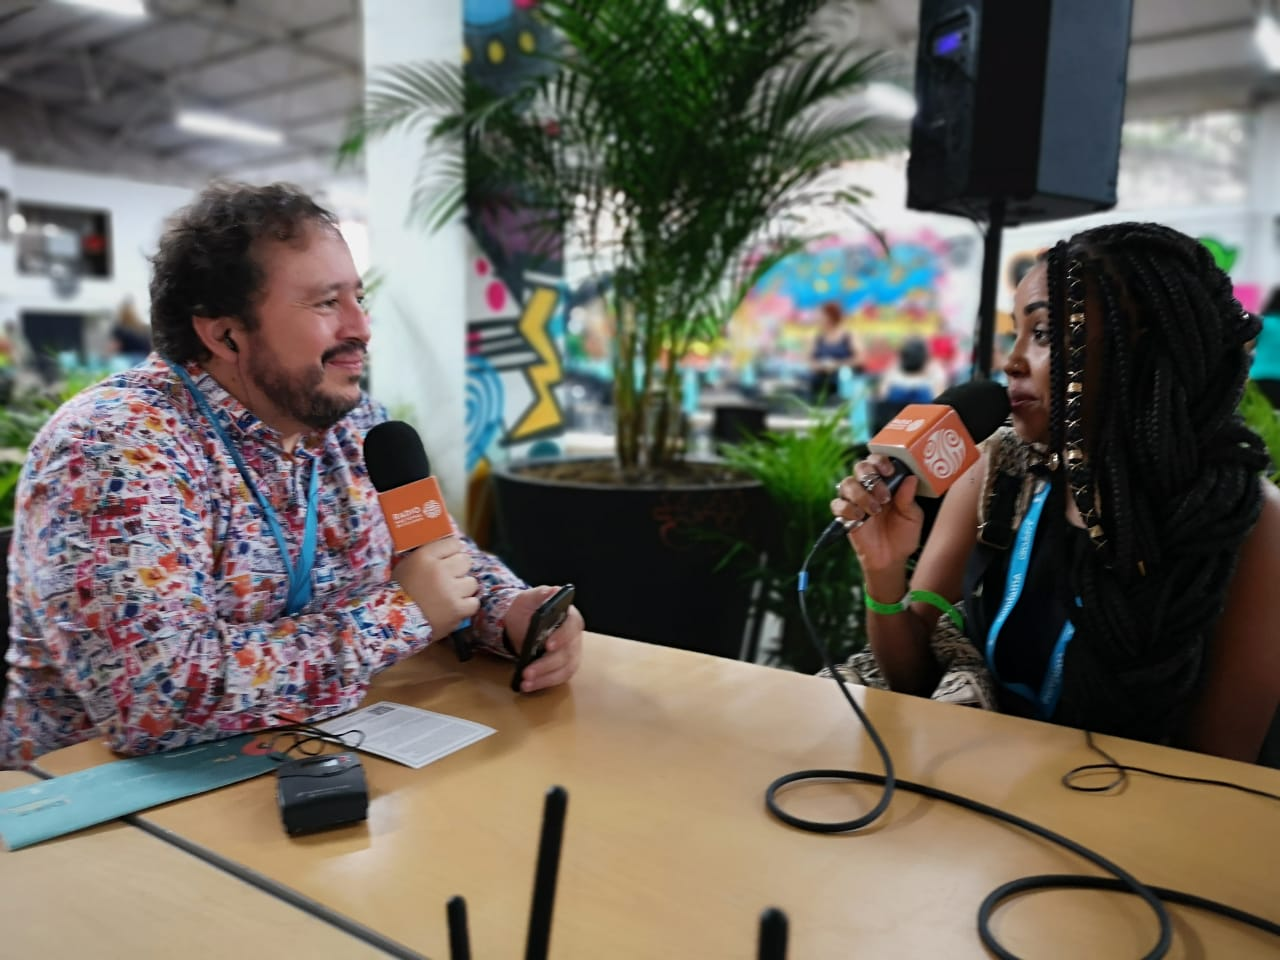 Entrevista con la artista brasilera Aiace desde Circulart. Foto: Jairo Jiménez.